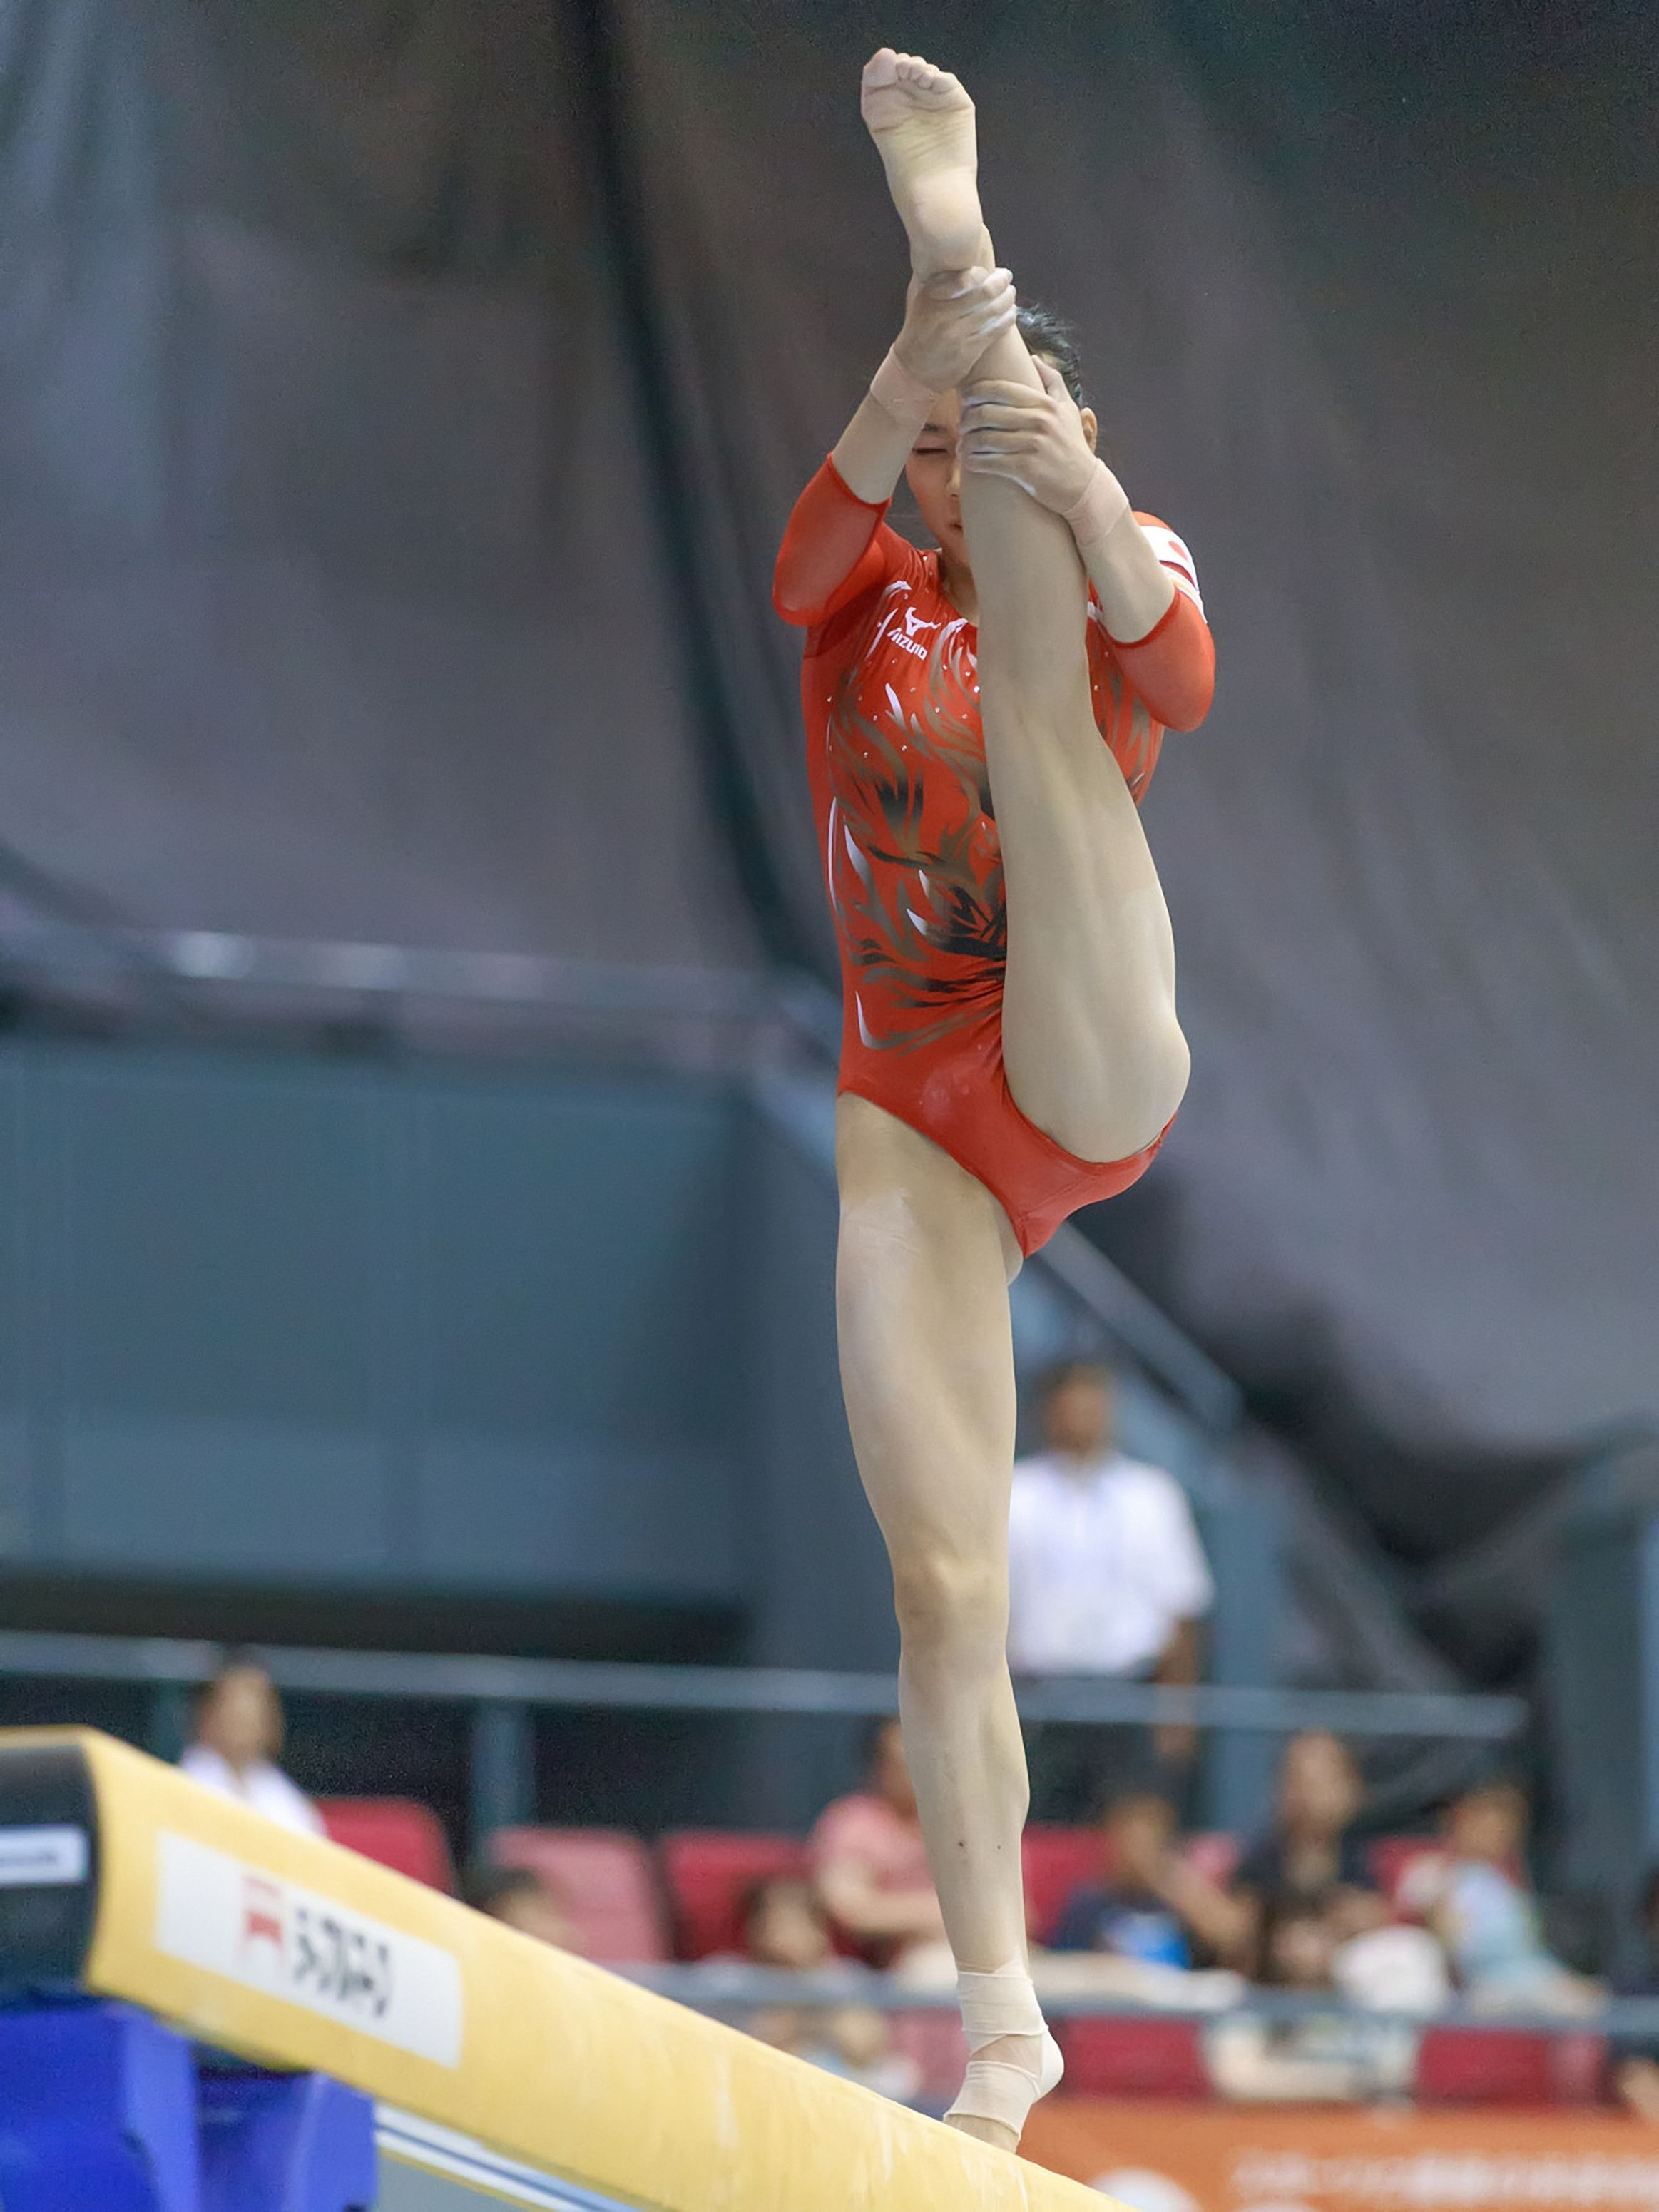 Pin by James McMillen on Gymnastics   Gymnastics